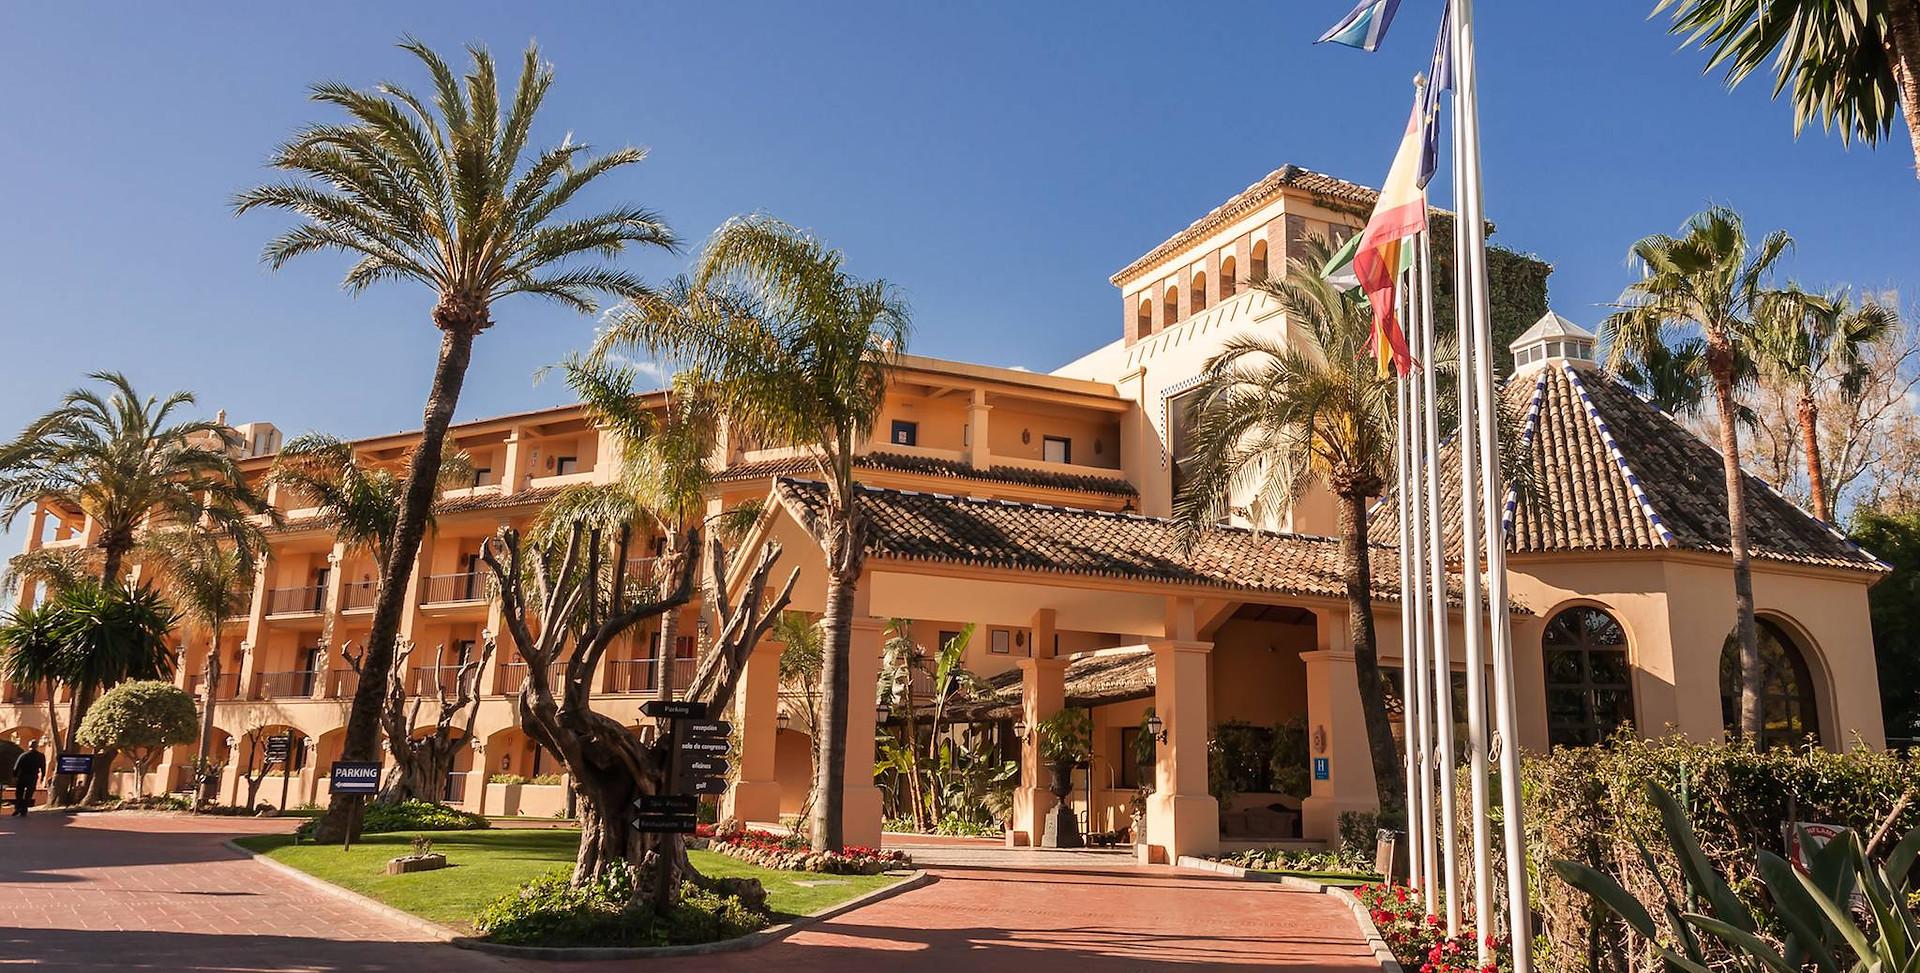 hotel-guadalmina-spa&golf-puregolf-1.jpg